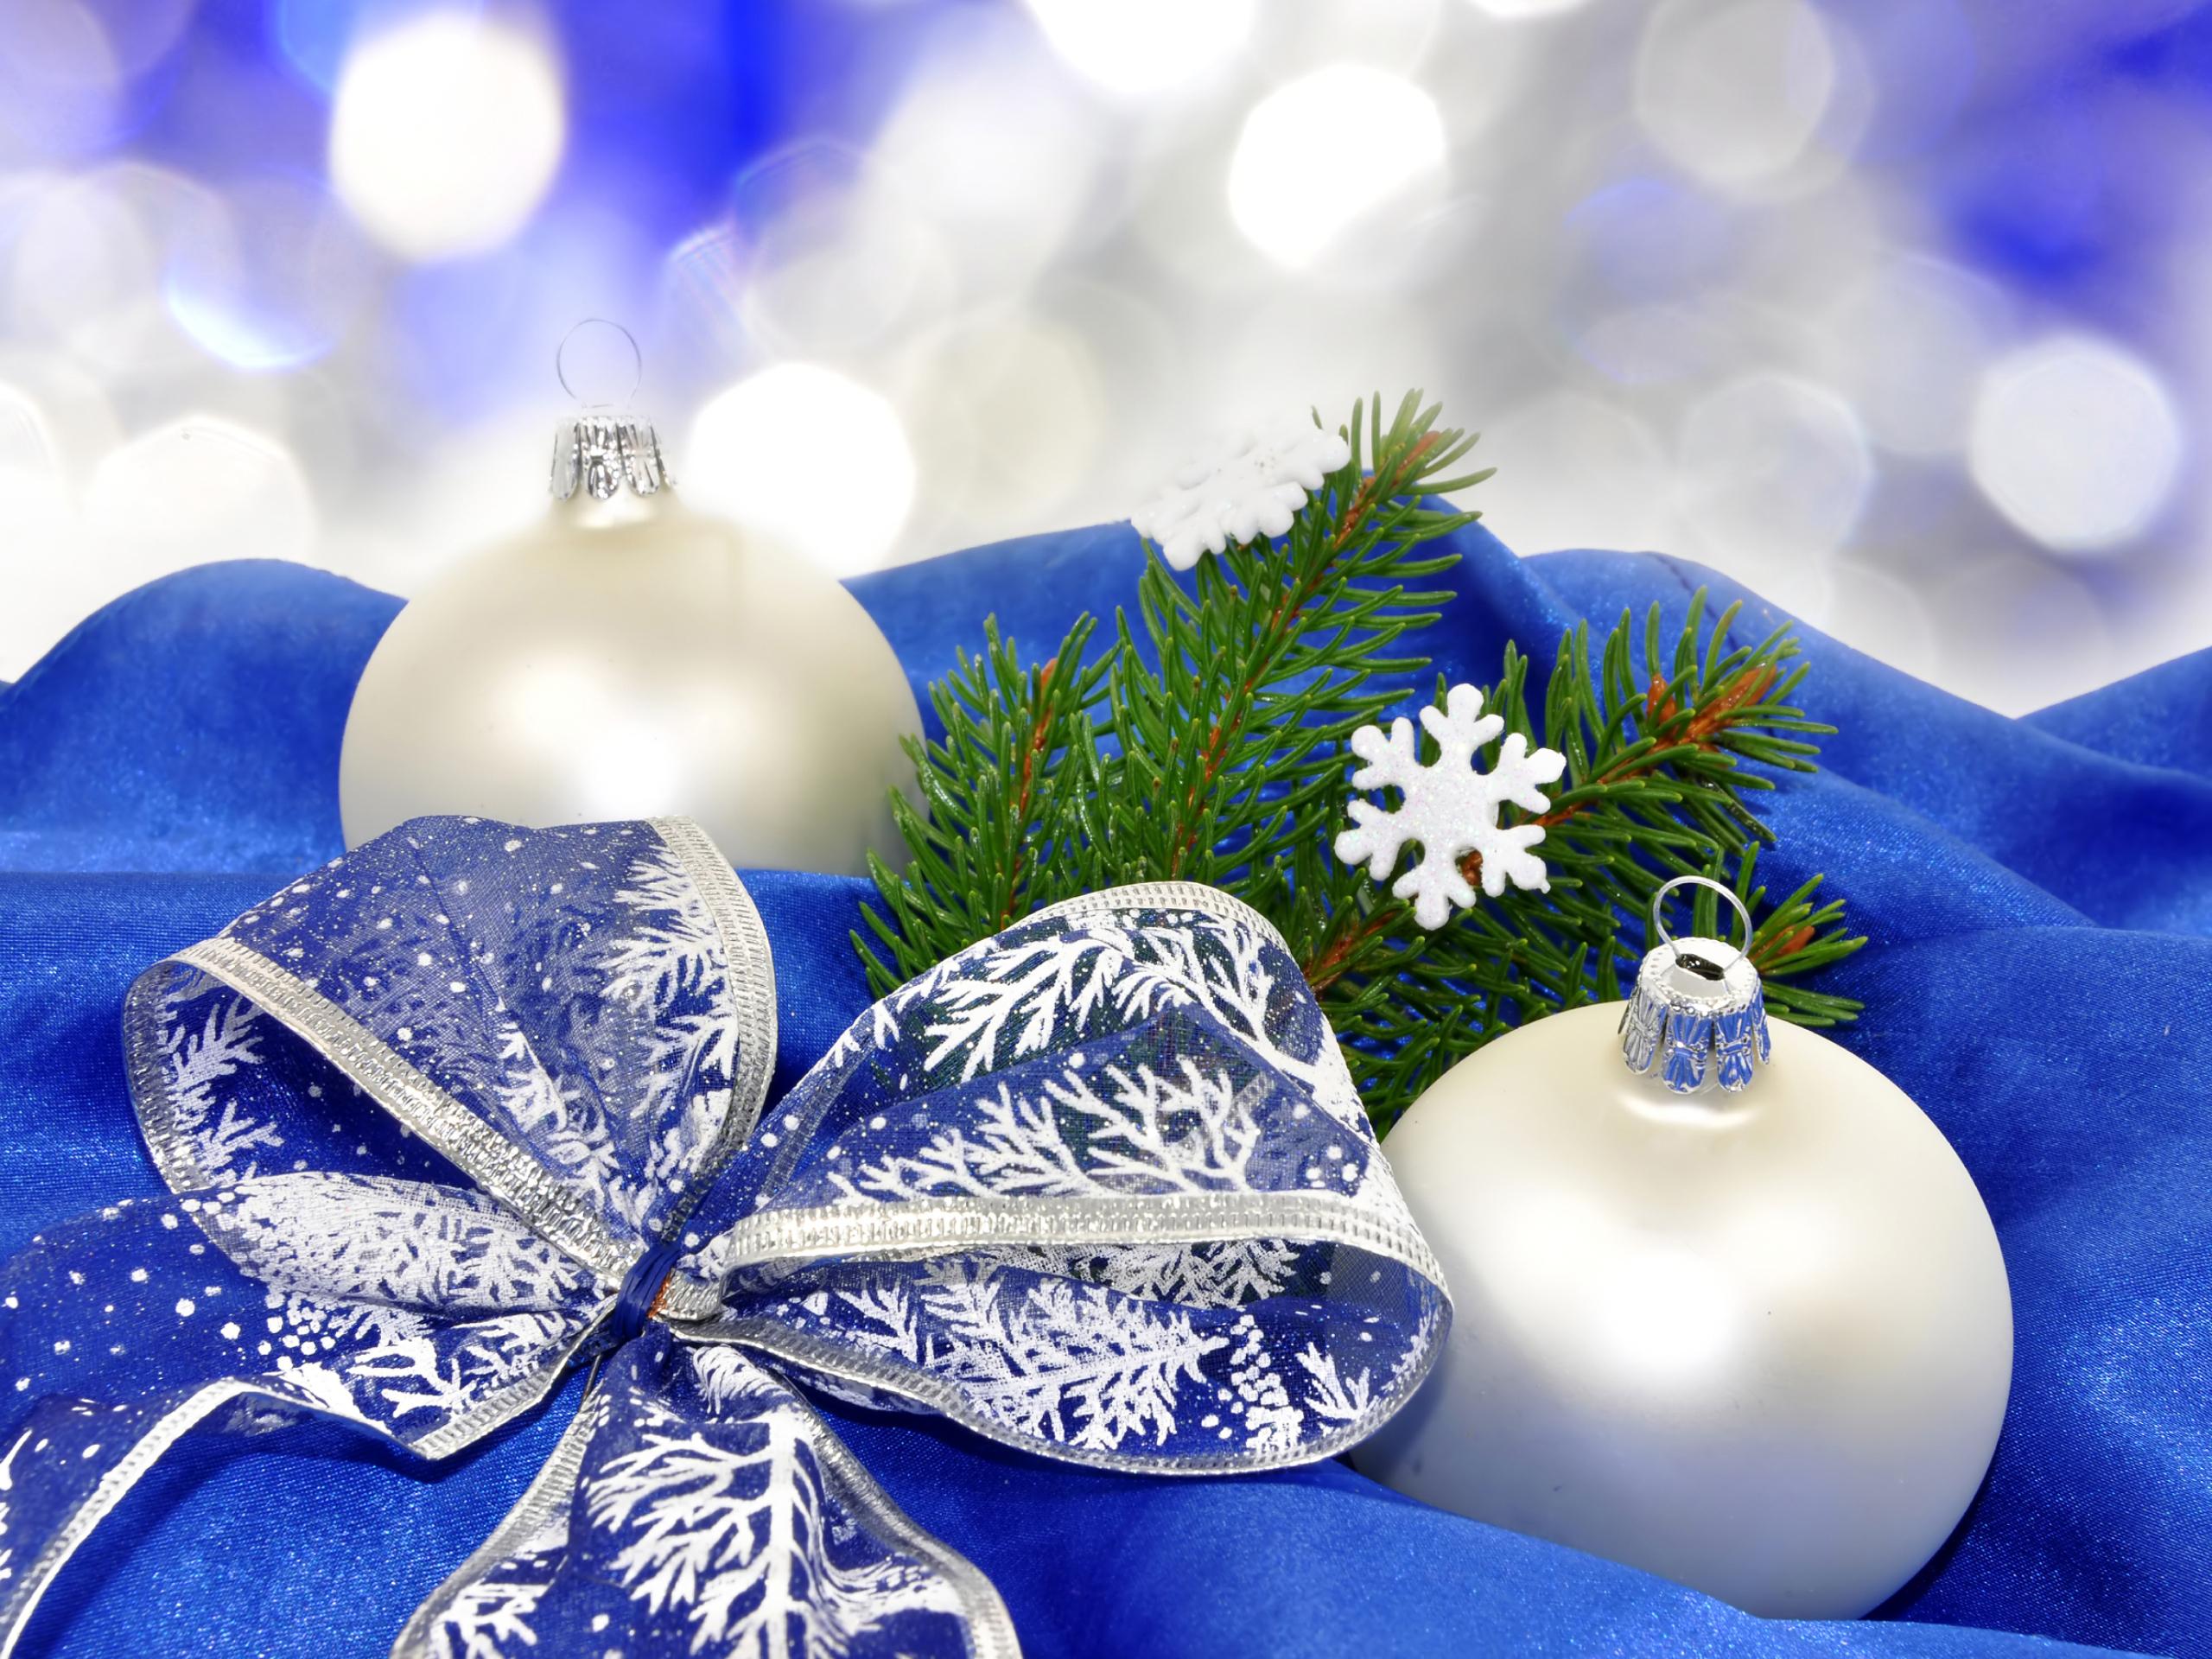 синие игрушки на белой елке без смс